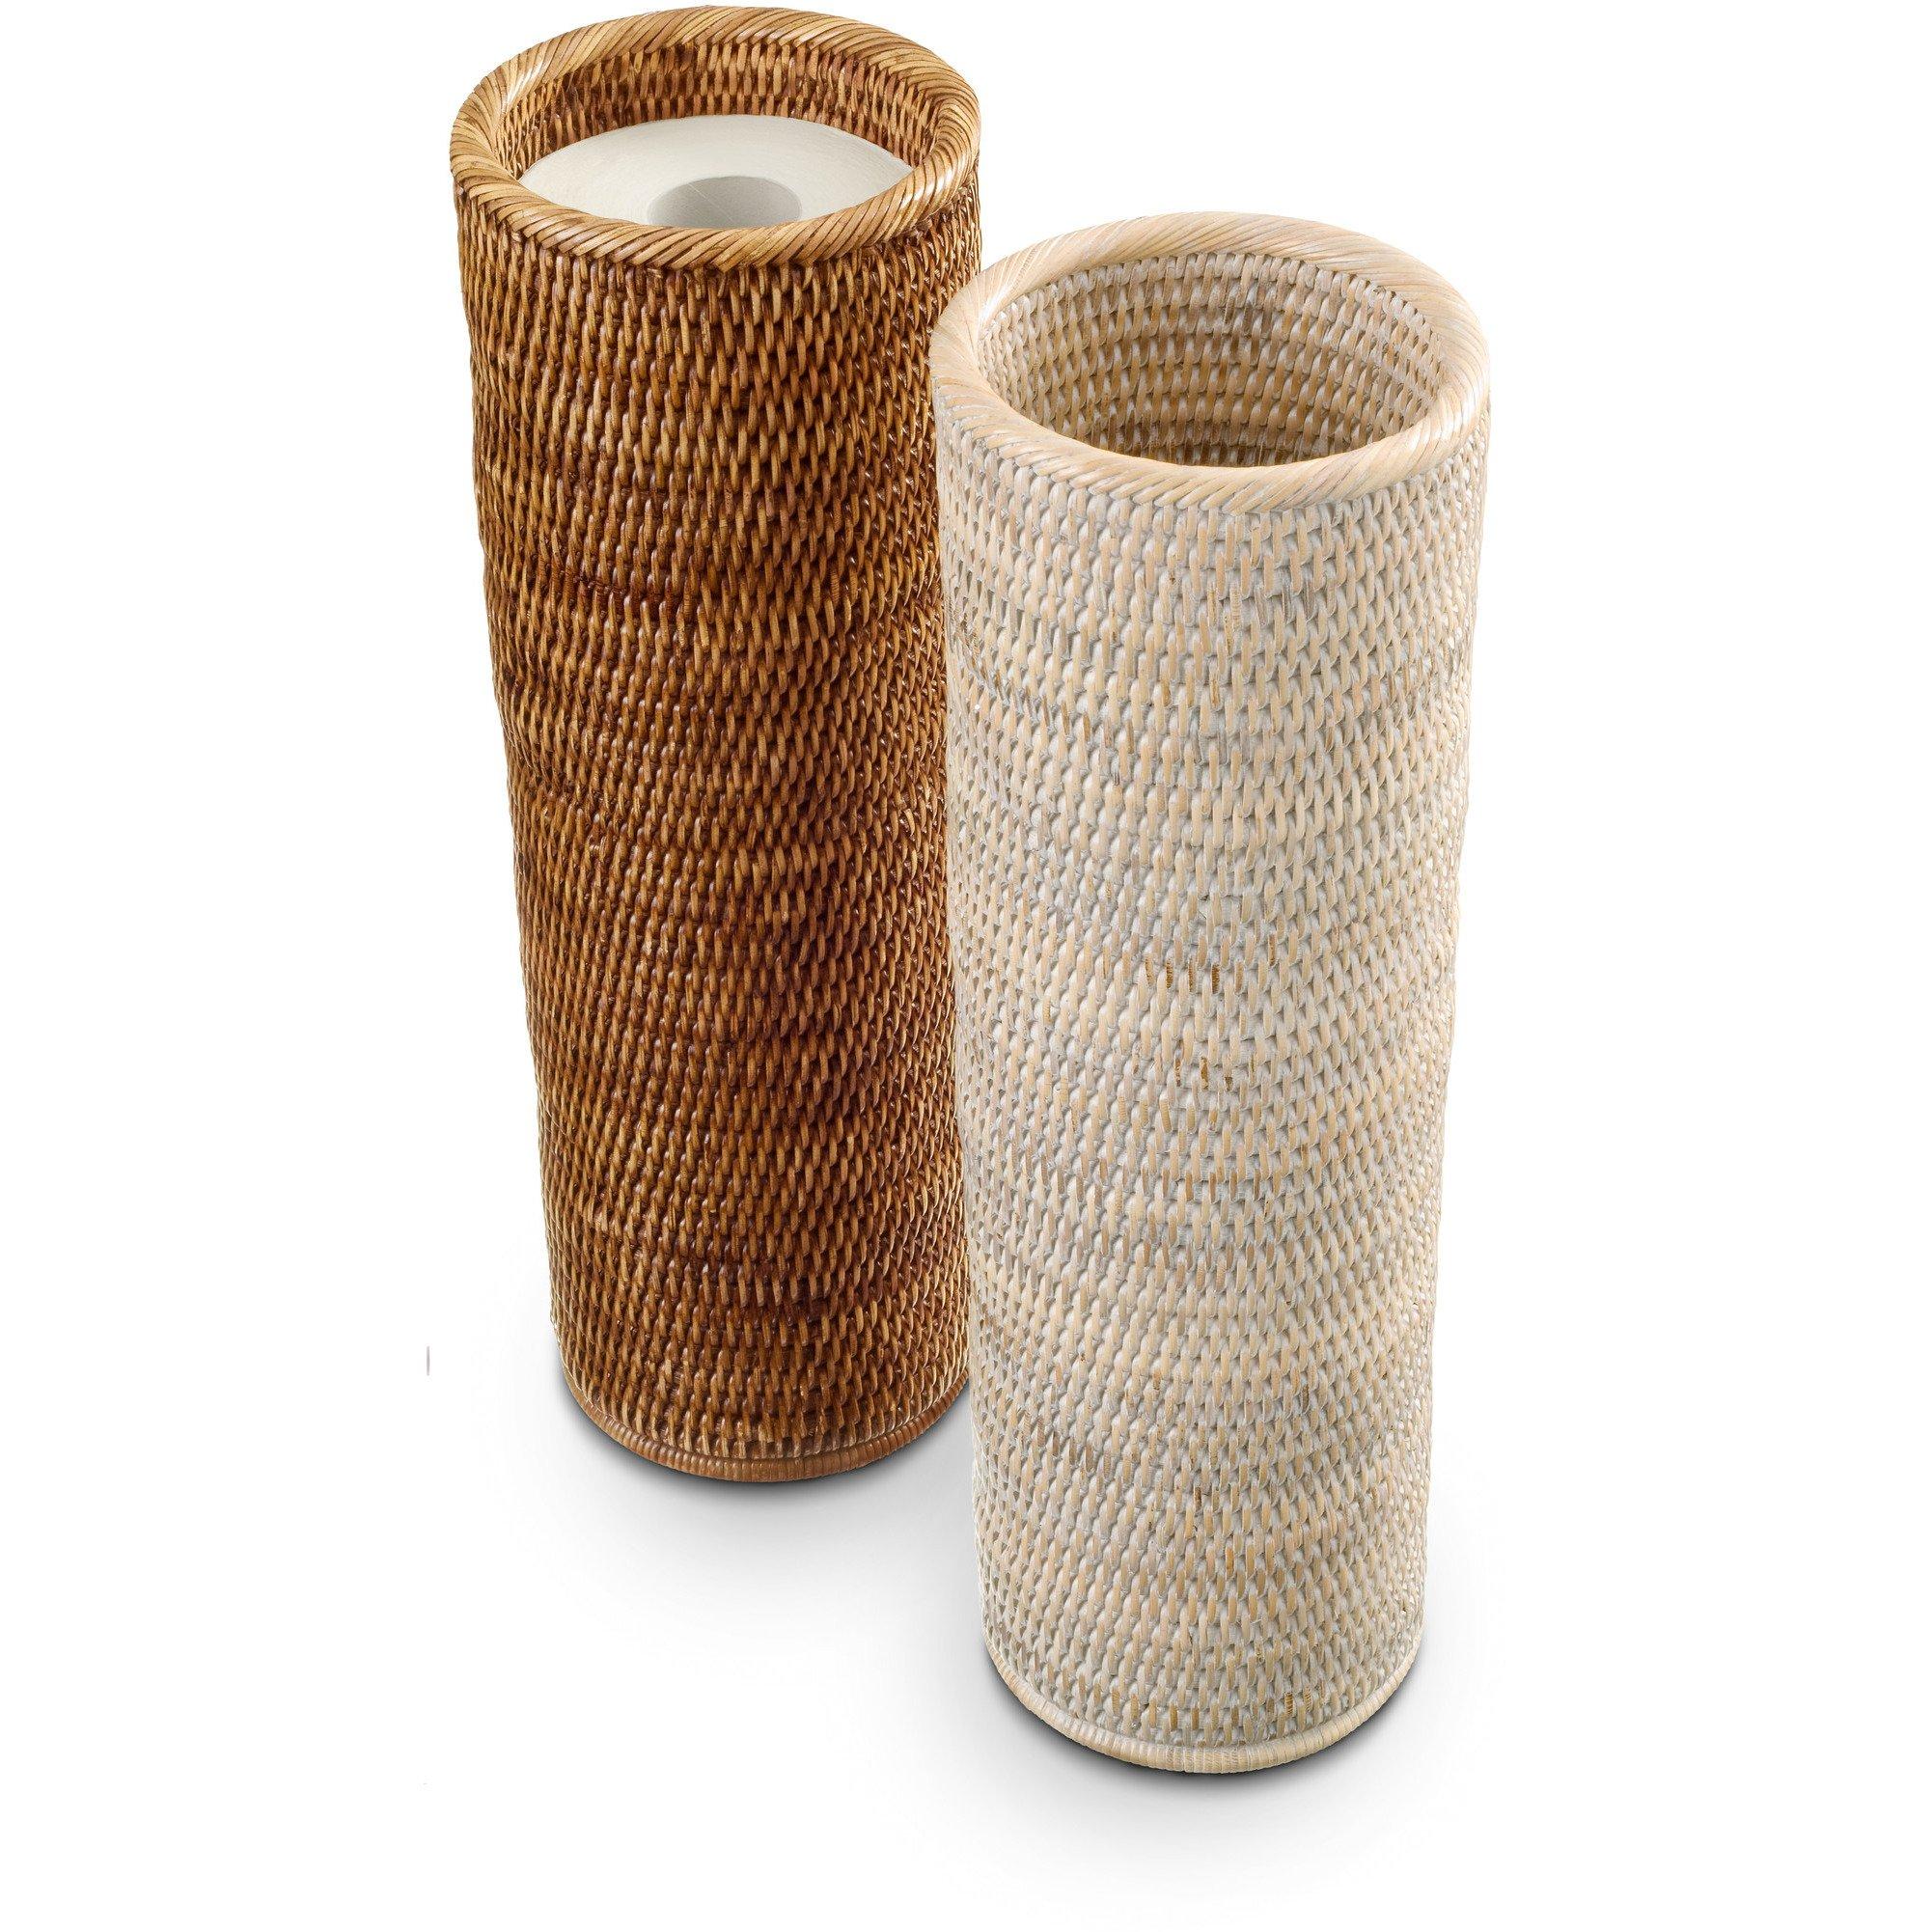 DWBA Malacca Round Free Standing Toilet Paper Holder Bathroom Storage - Rattan (Light Rattan)